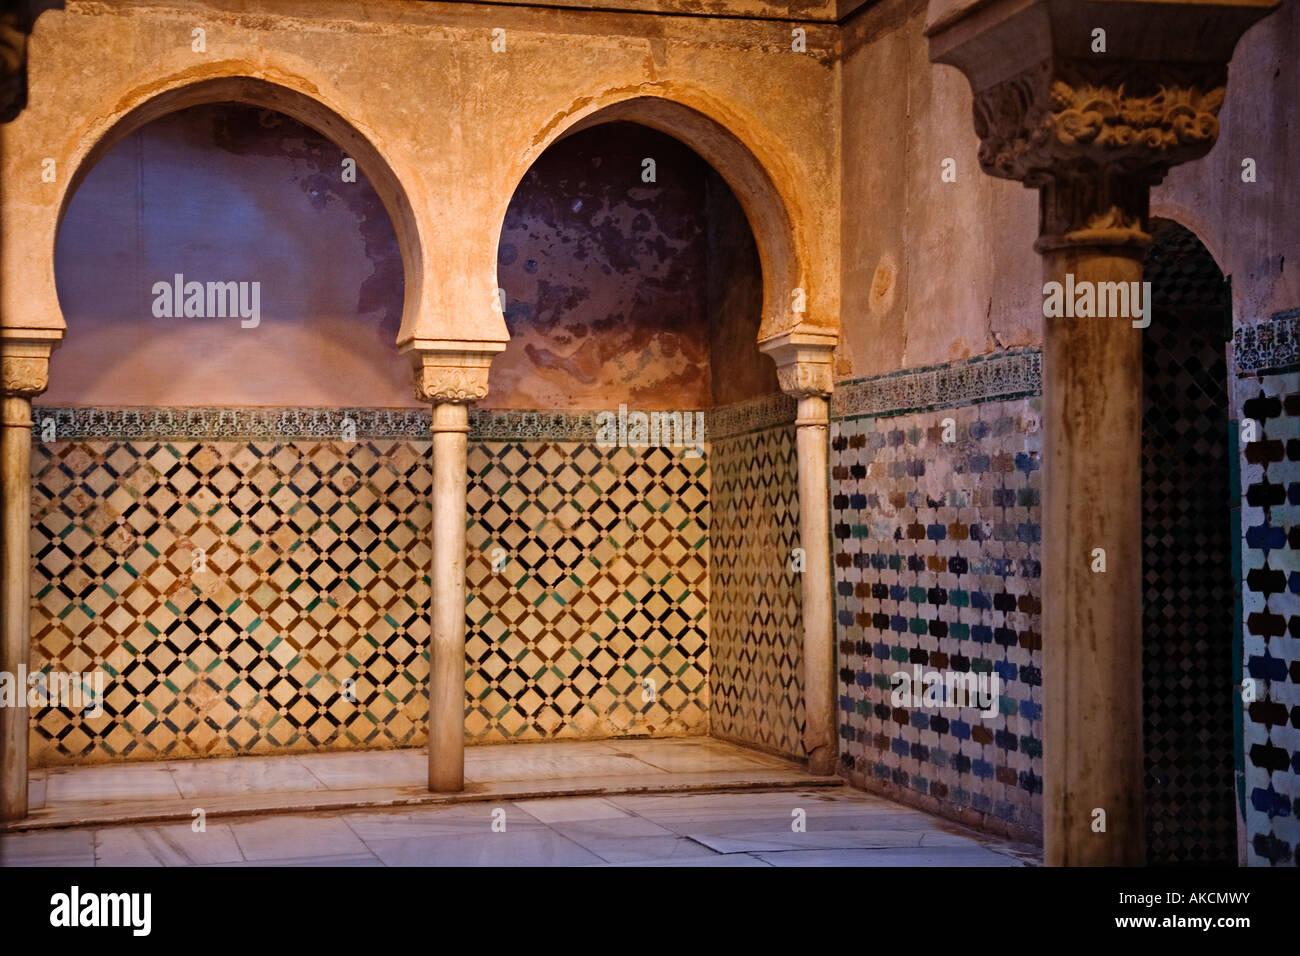 Baños Granada | Banos Arabes Alhambra Granada Andalucia Espana Alhambra Arab Stock